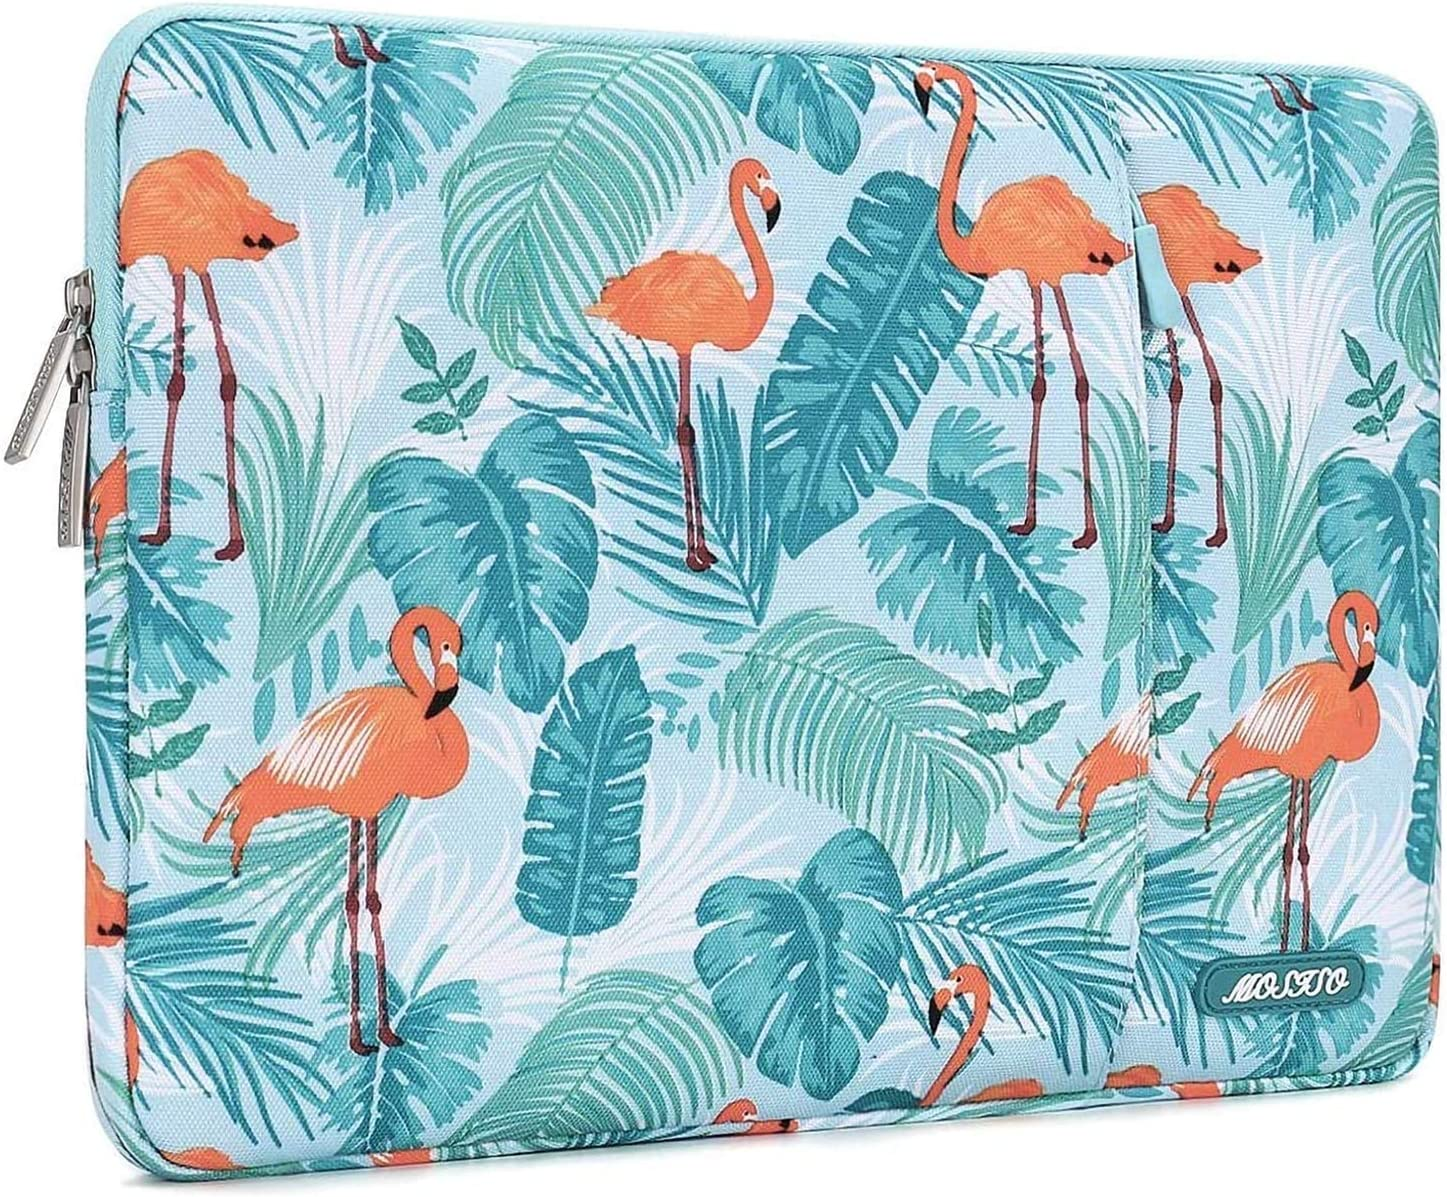 Flamingo Laptop Sleeve Protective case Flamingo Print Laptop Cover Laptop Sleeve 13 inch Laptop Sleeve 15 inch Laptop Sleeve for MacBook